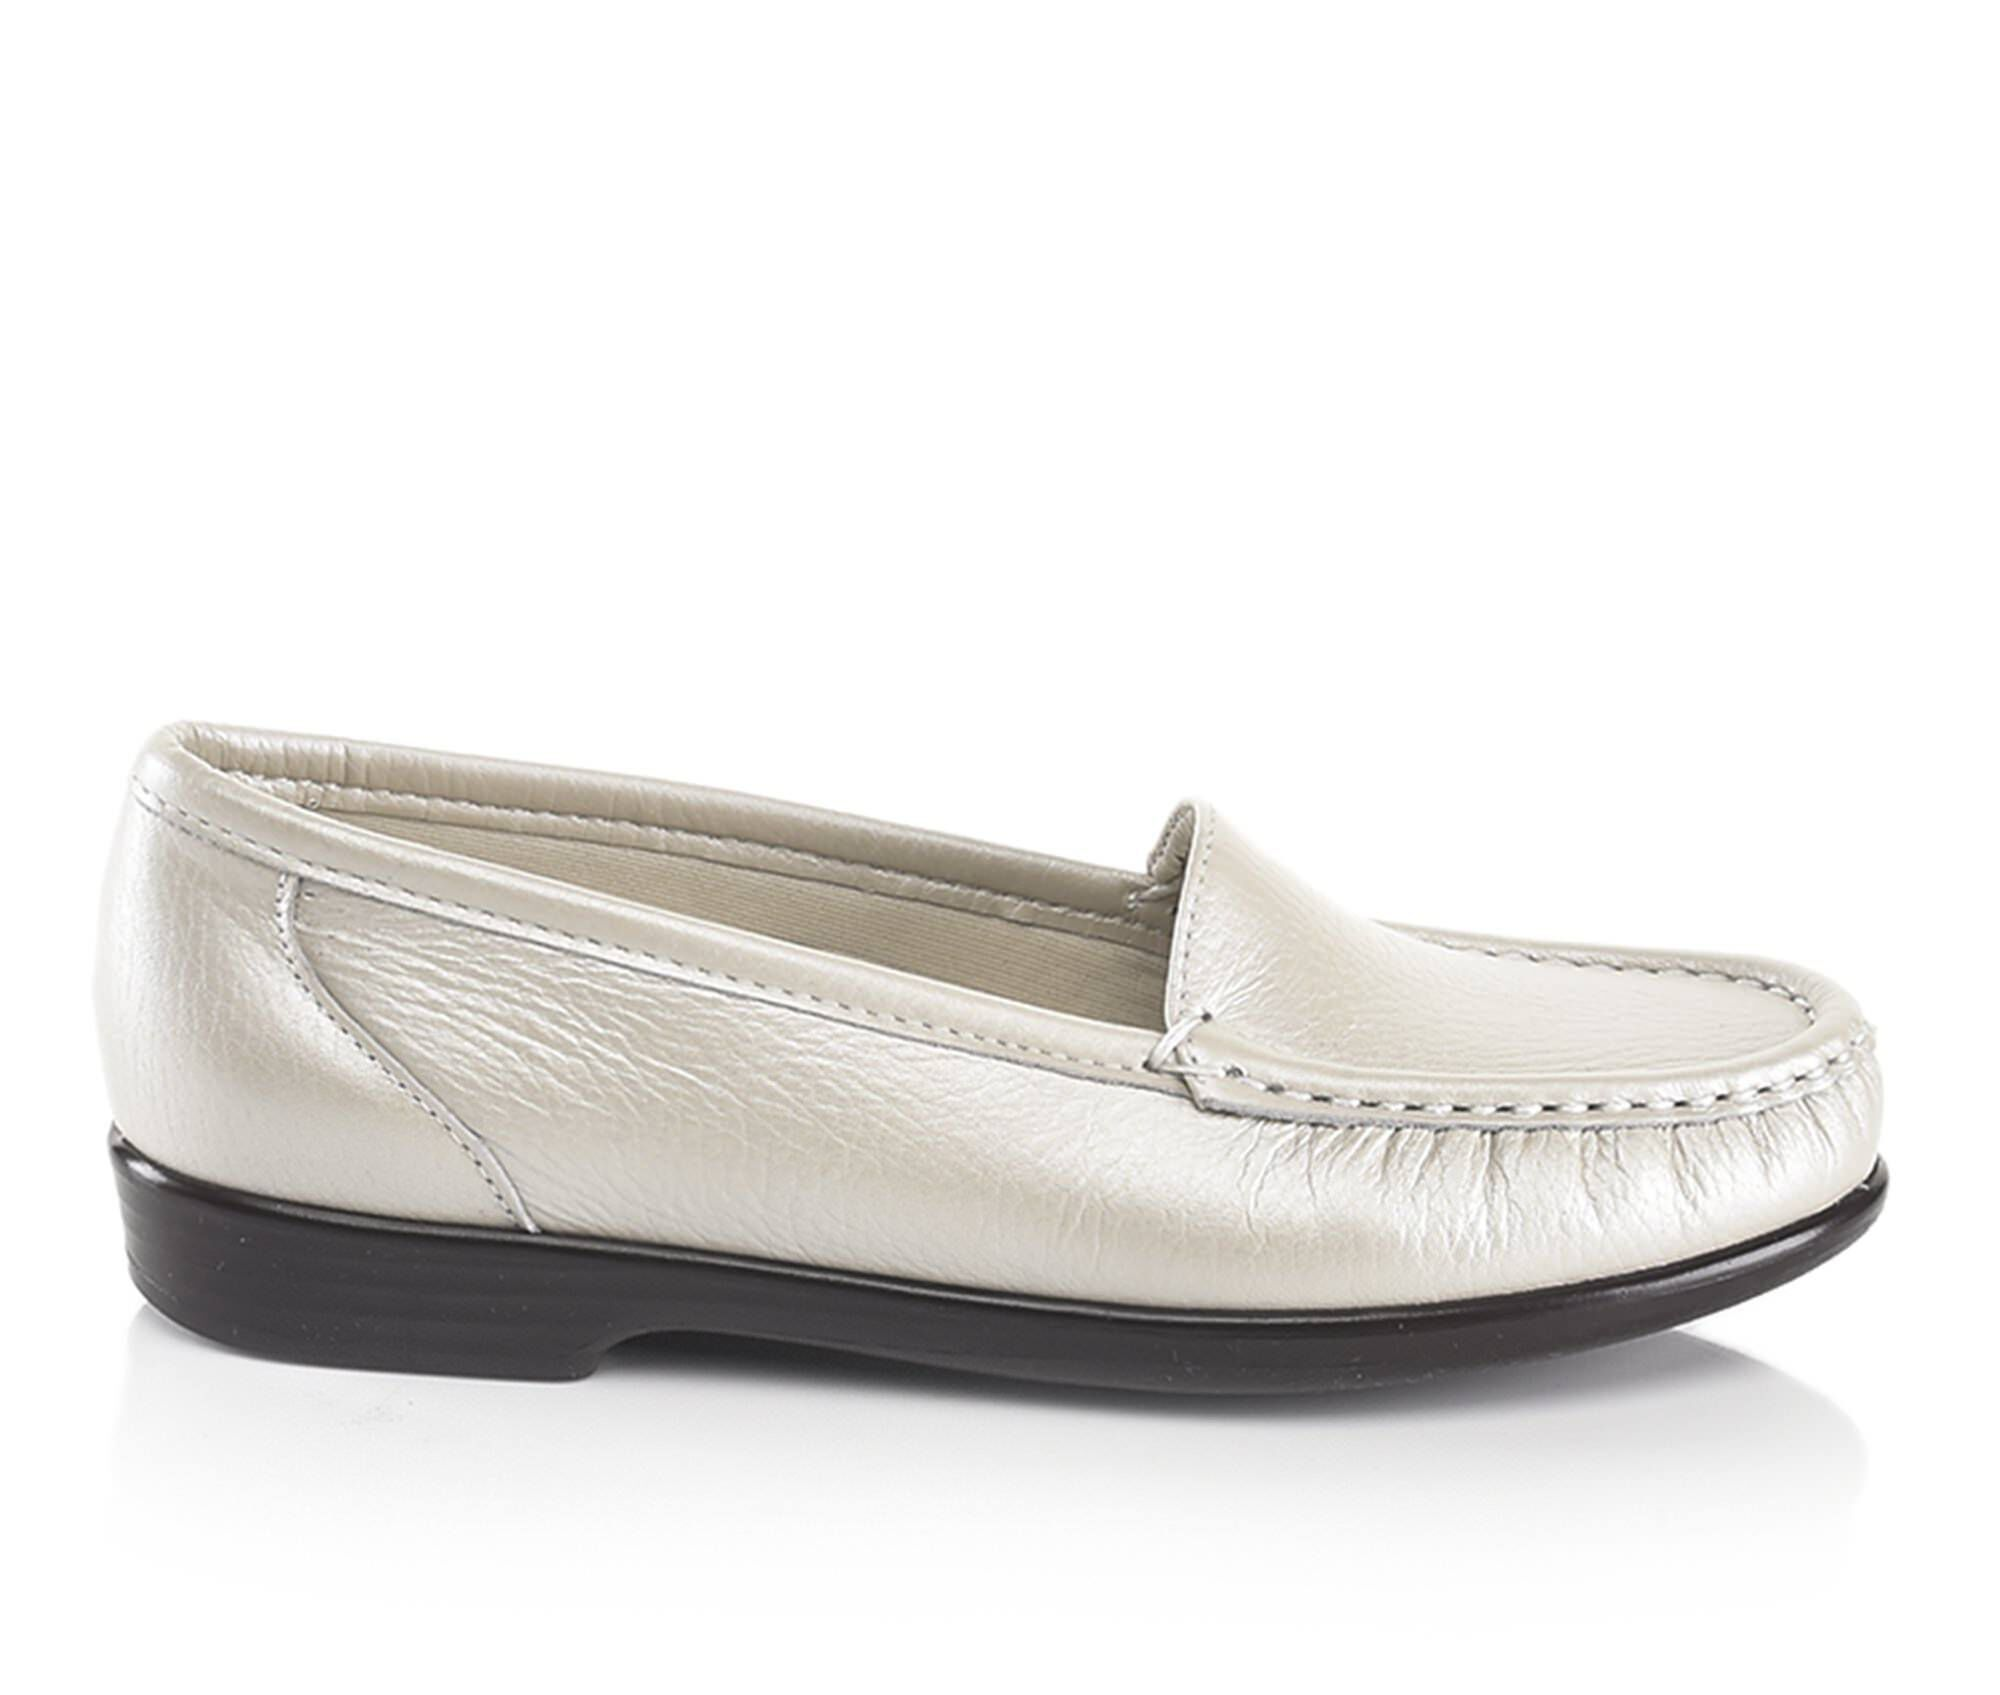 Sas Comfort Shoes | Shoe Carnival